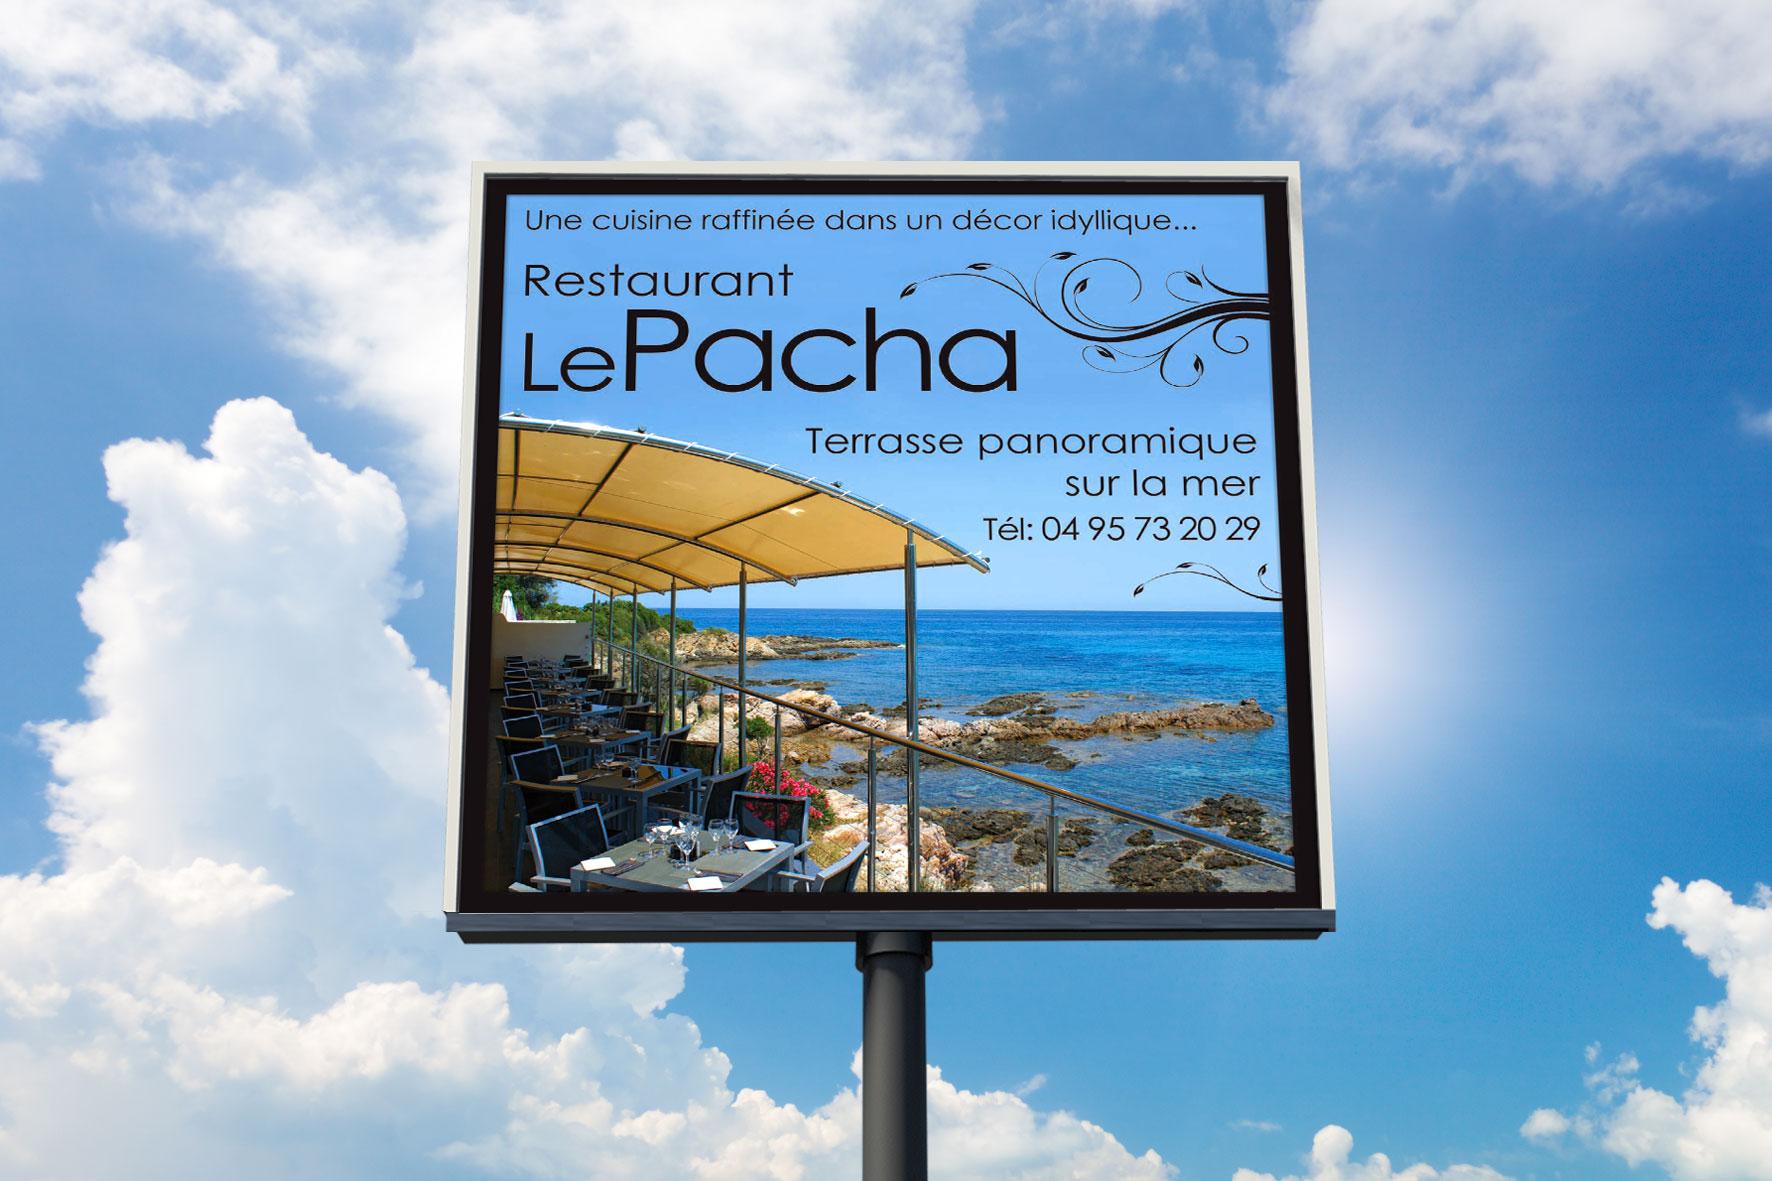 Restaurant Le Pacha